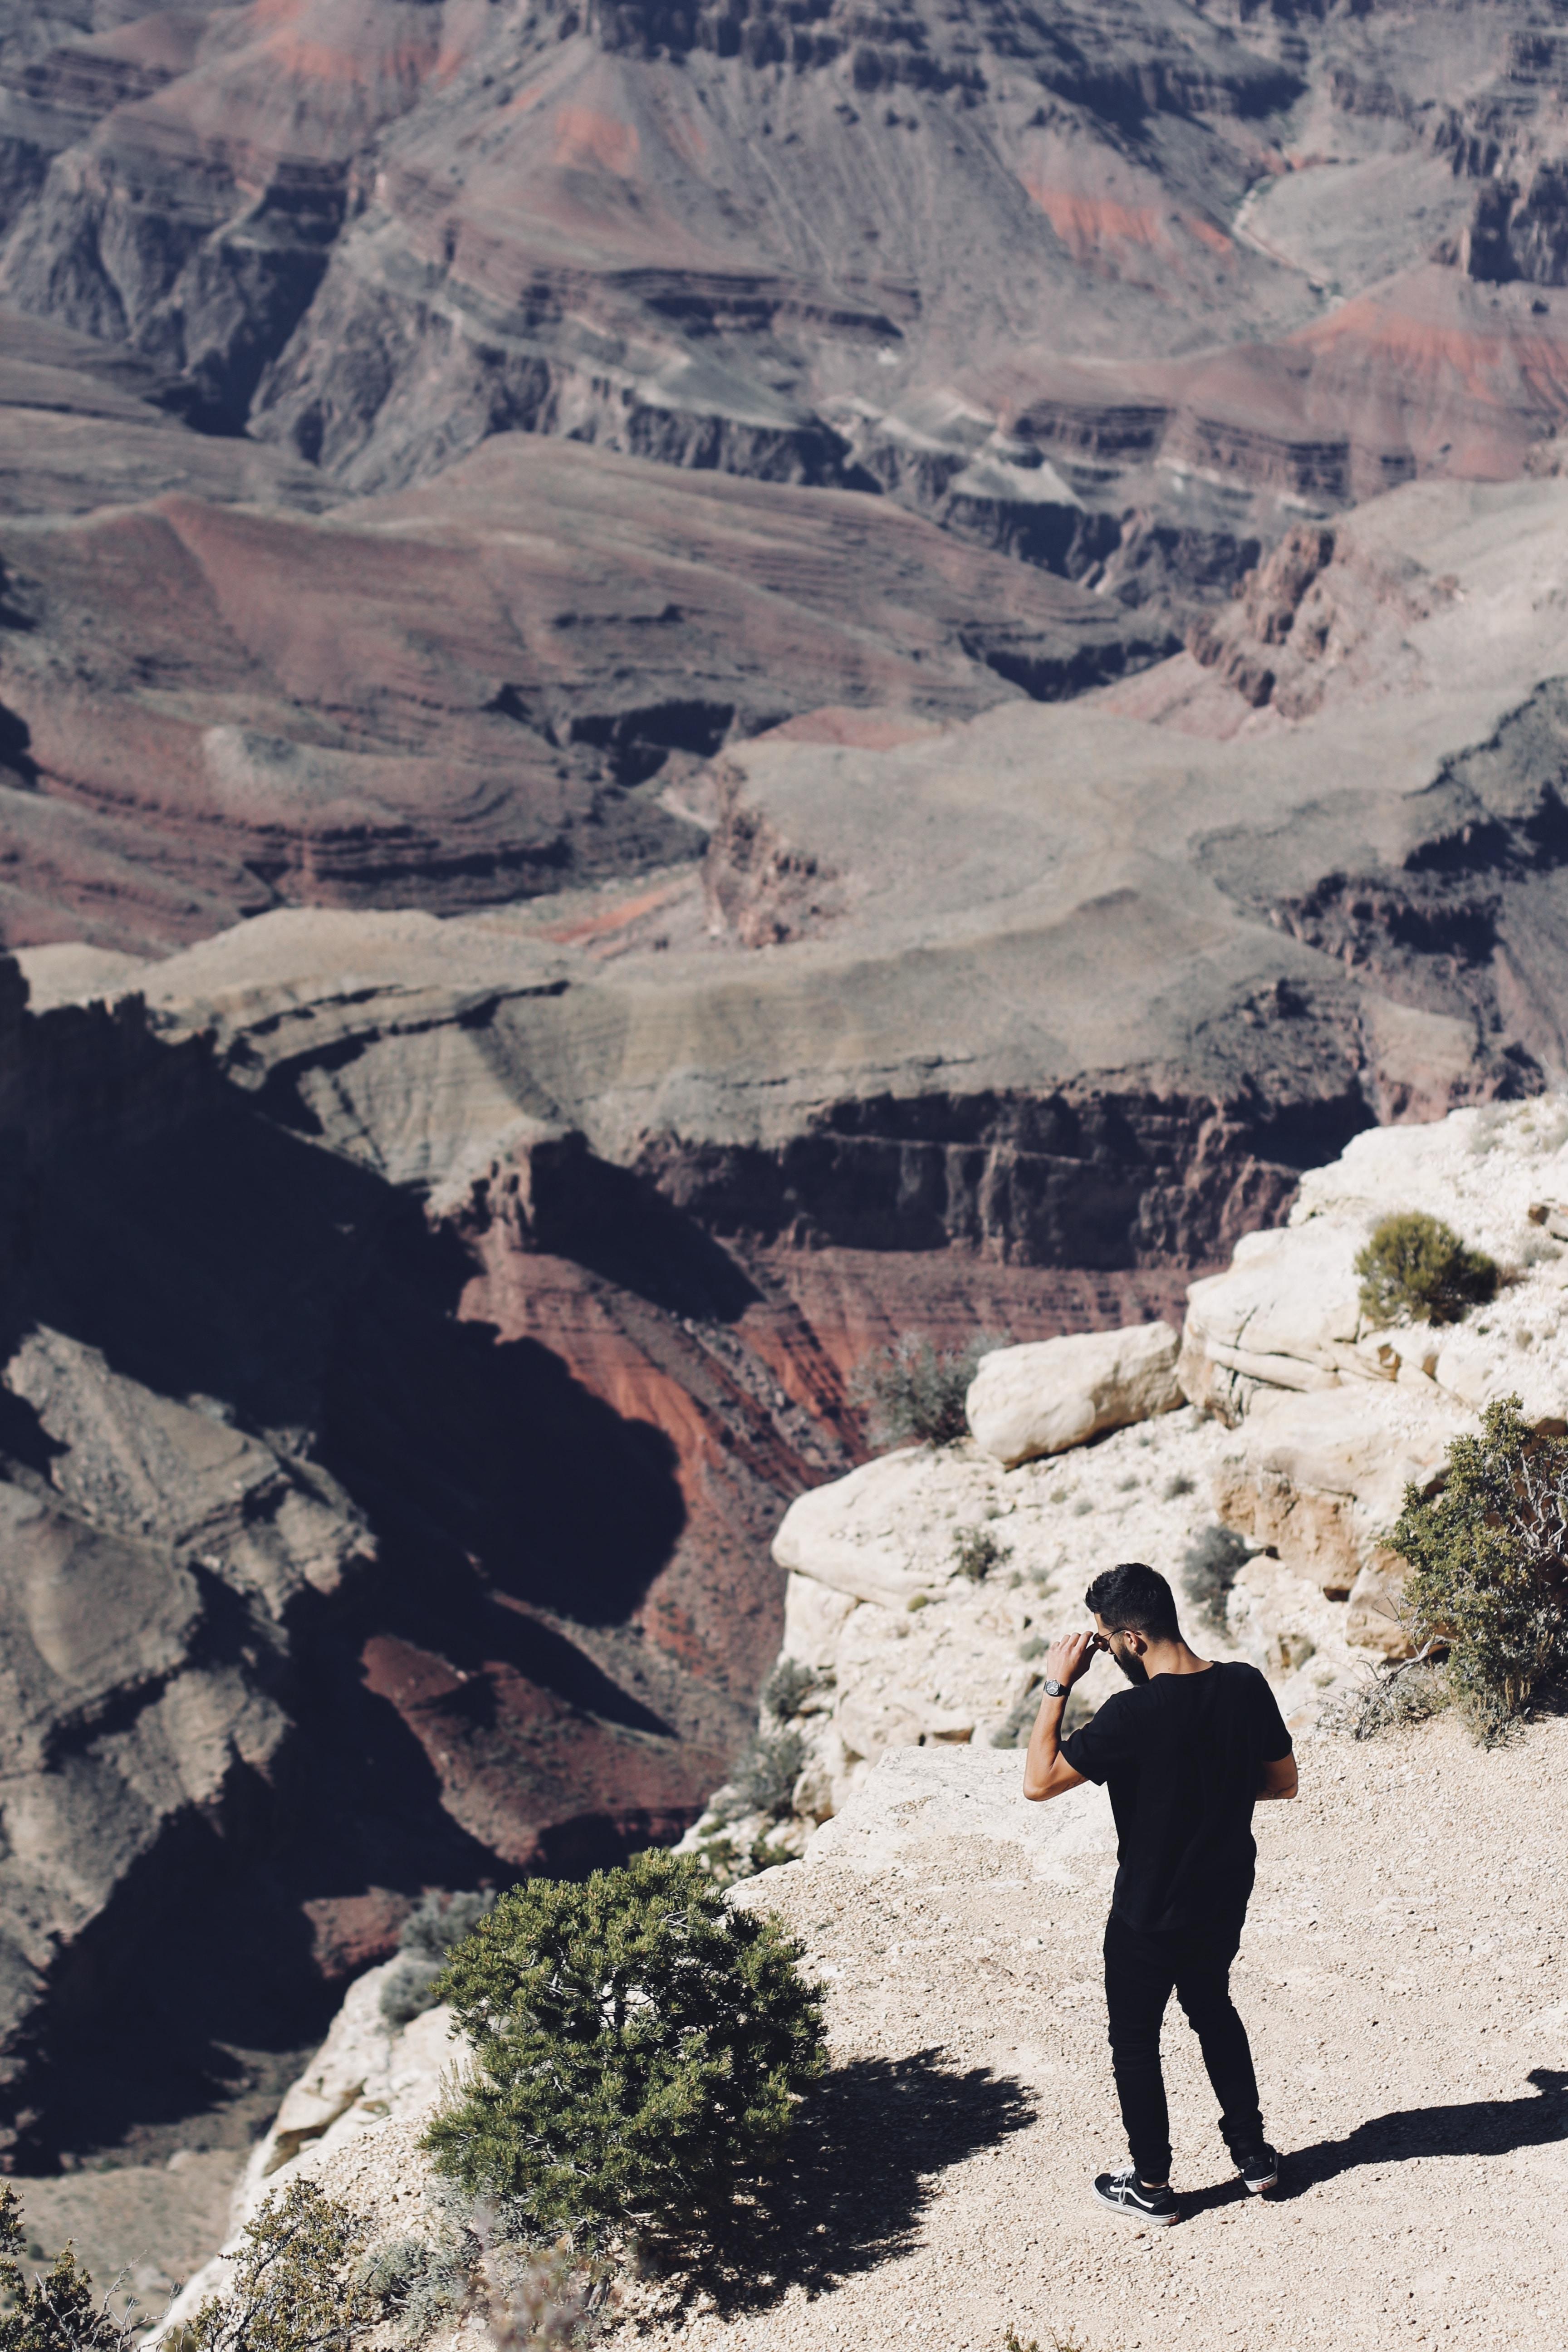 man standing on mountain rocks